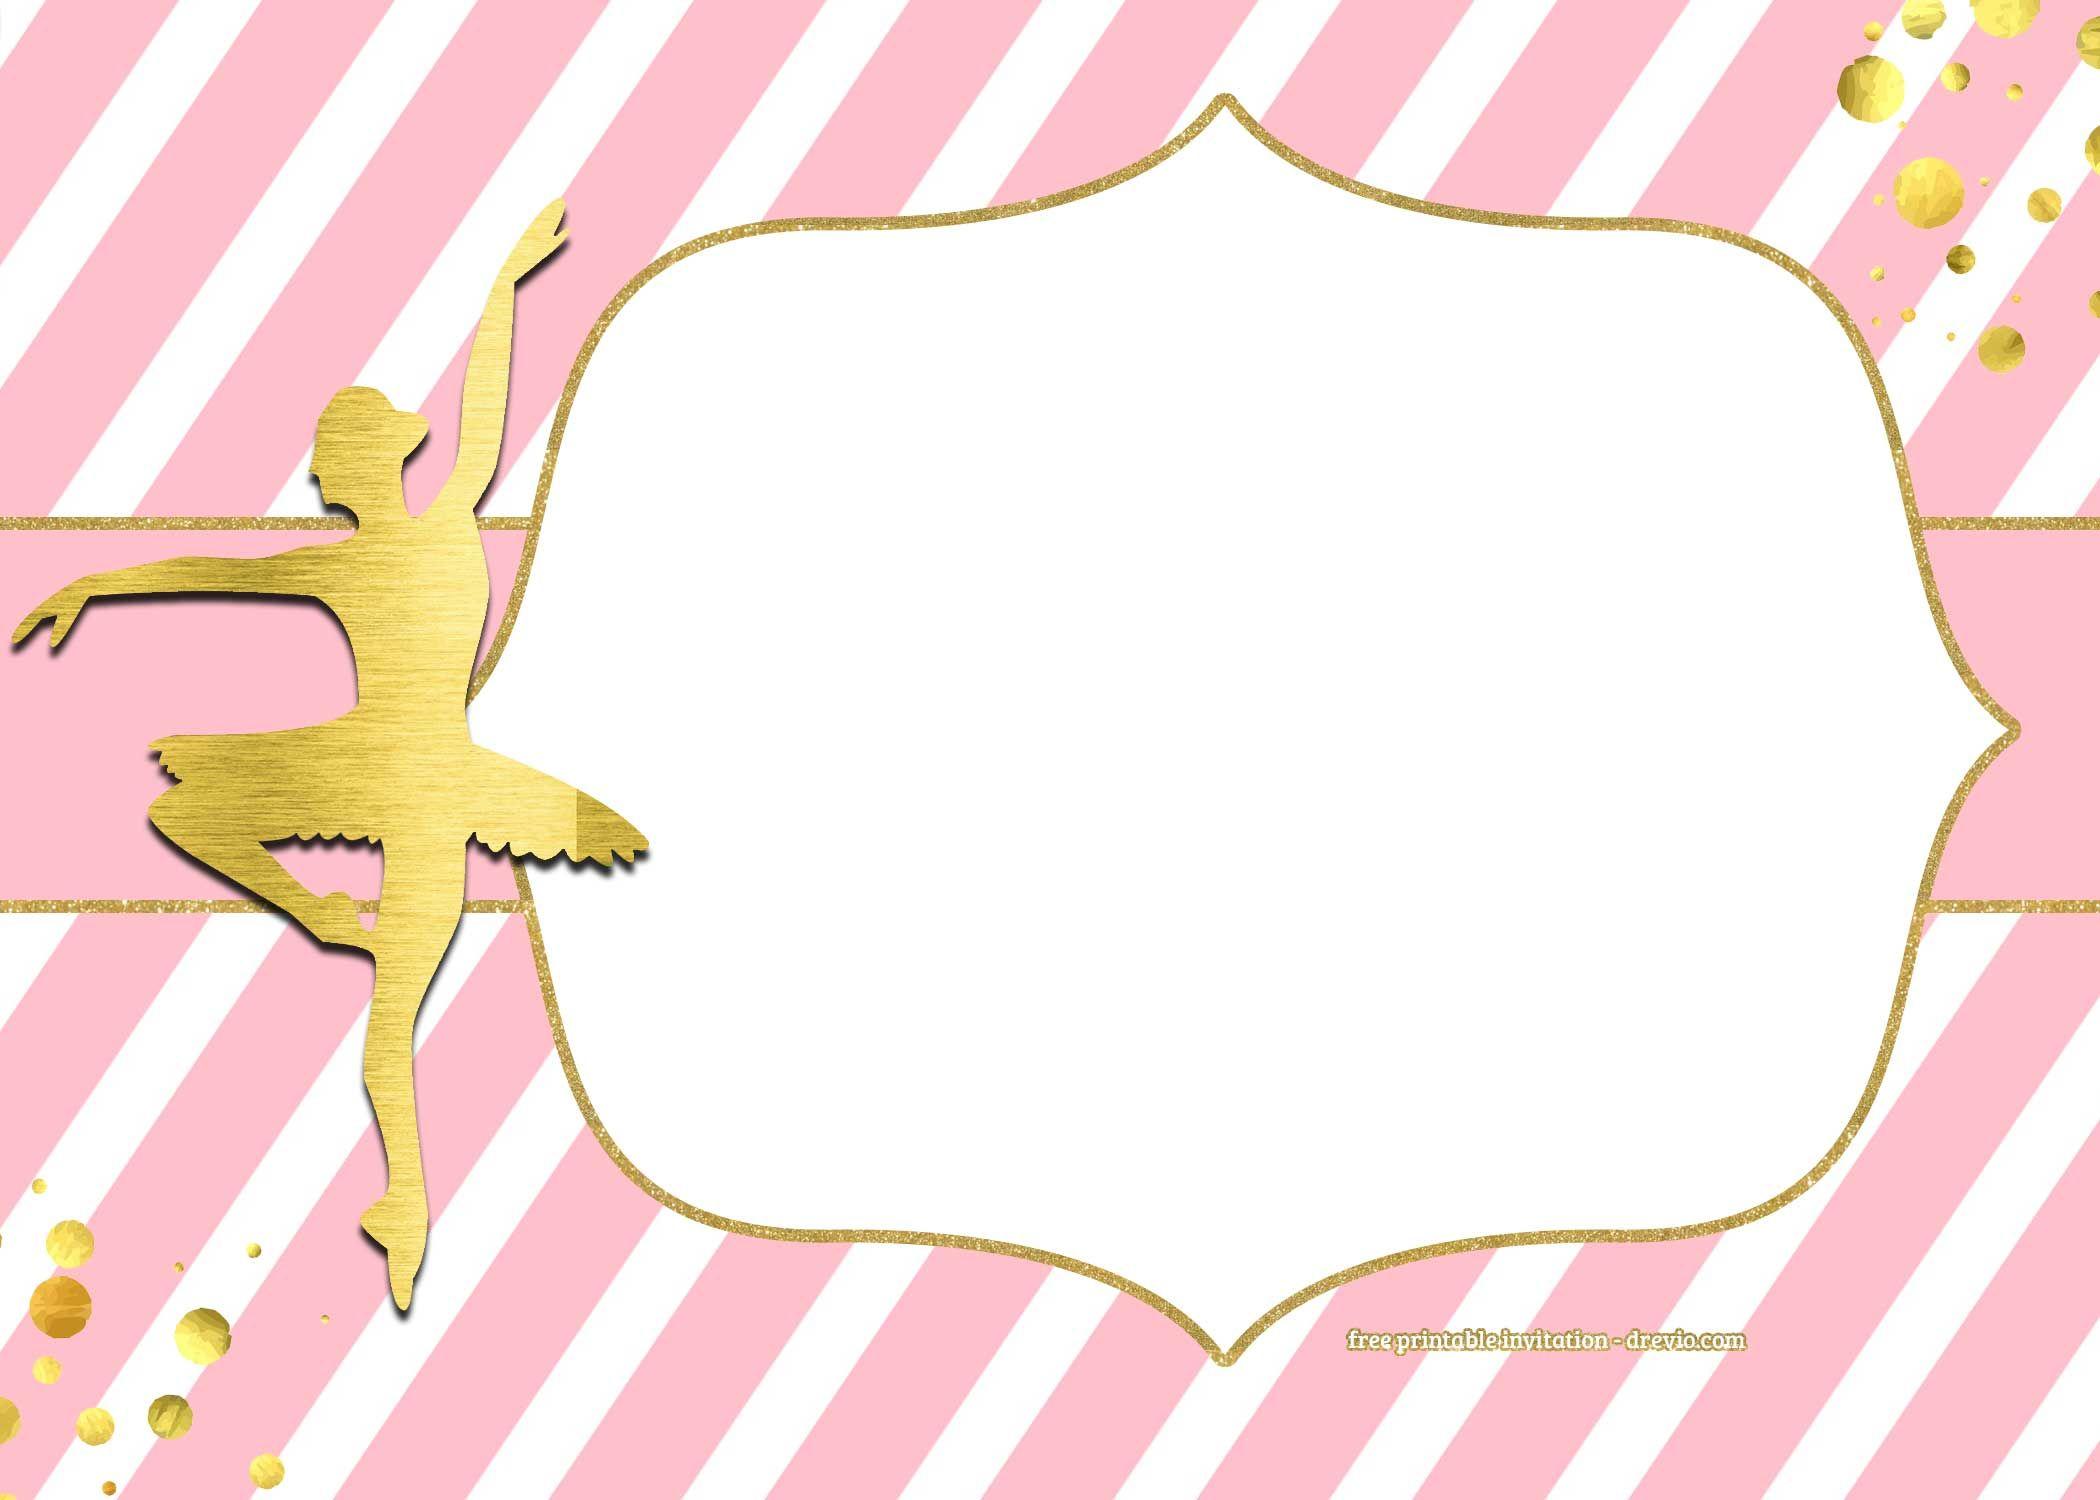 Download FREE Golden Ballerina Birthday Invitation Templates